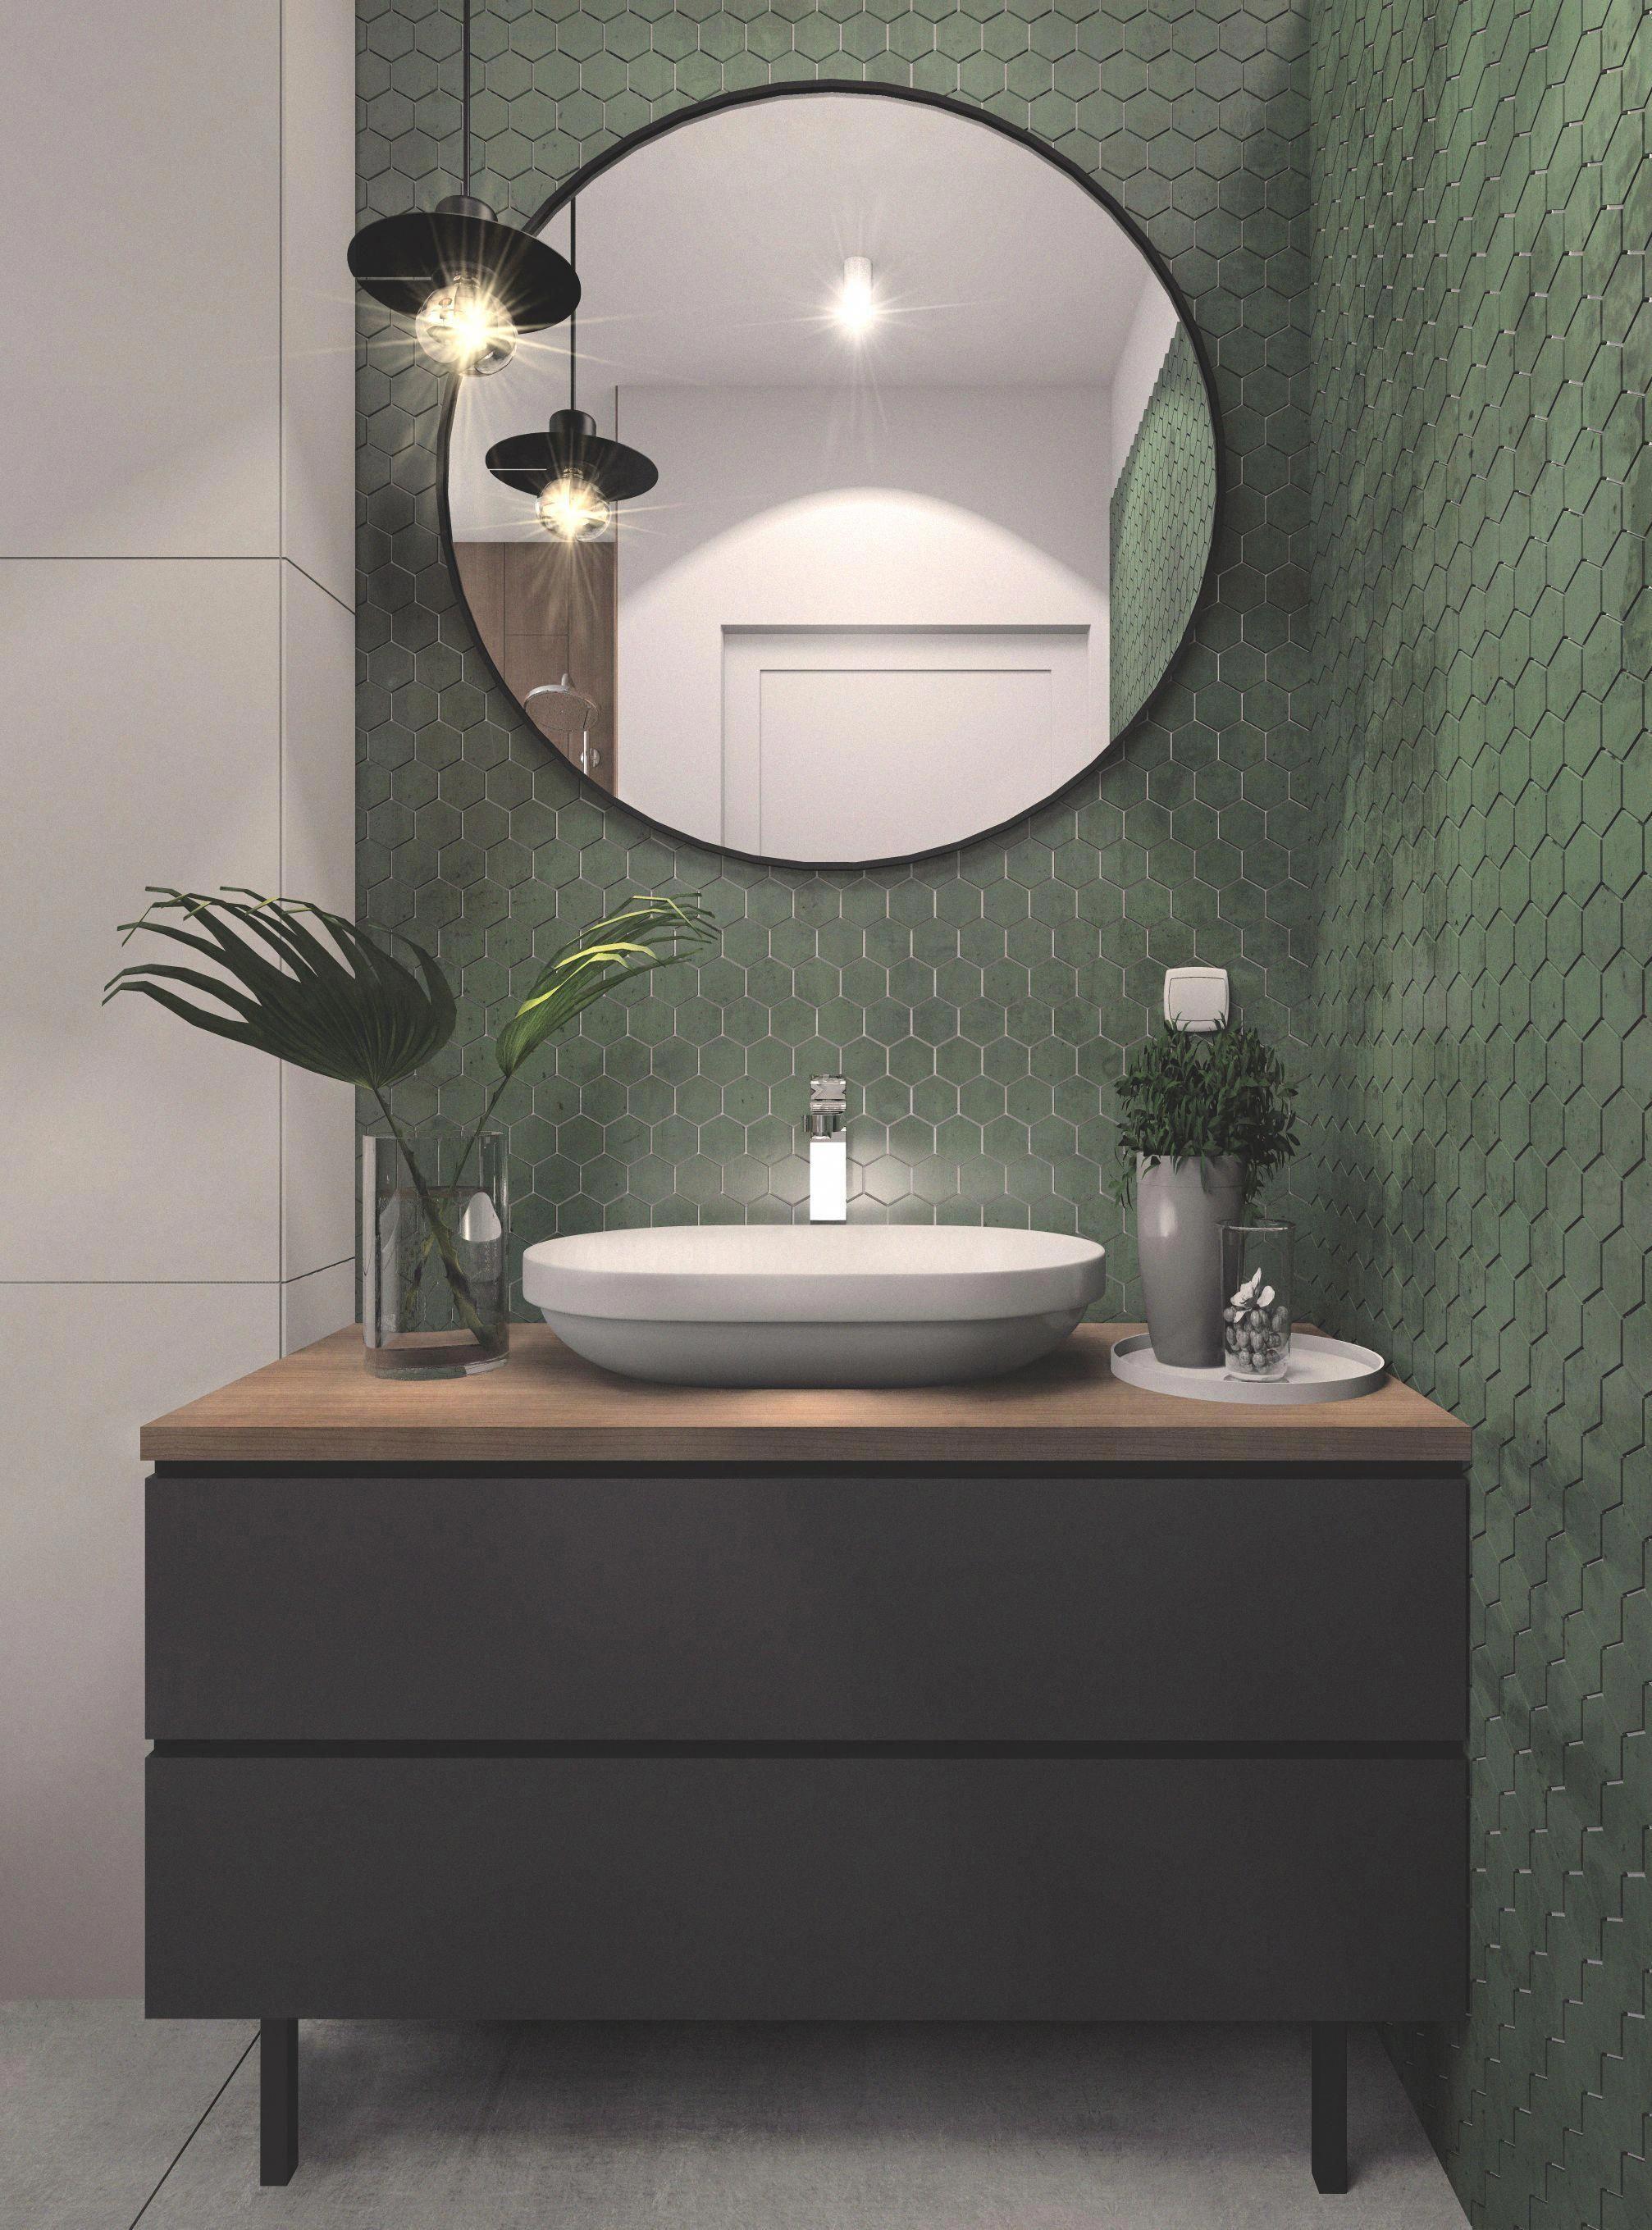 Minimalist Bathroom Wet Rooms Minimalistbathroomrental Refferal 4978317010 Wetrooms Min Green Bathroom Decor Bathroom Interior Design Modern Bathroom Design